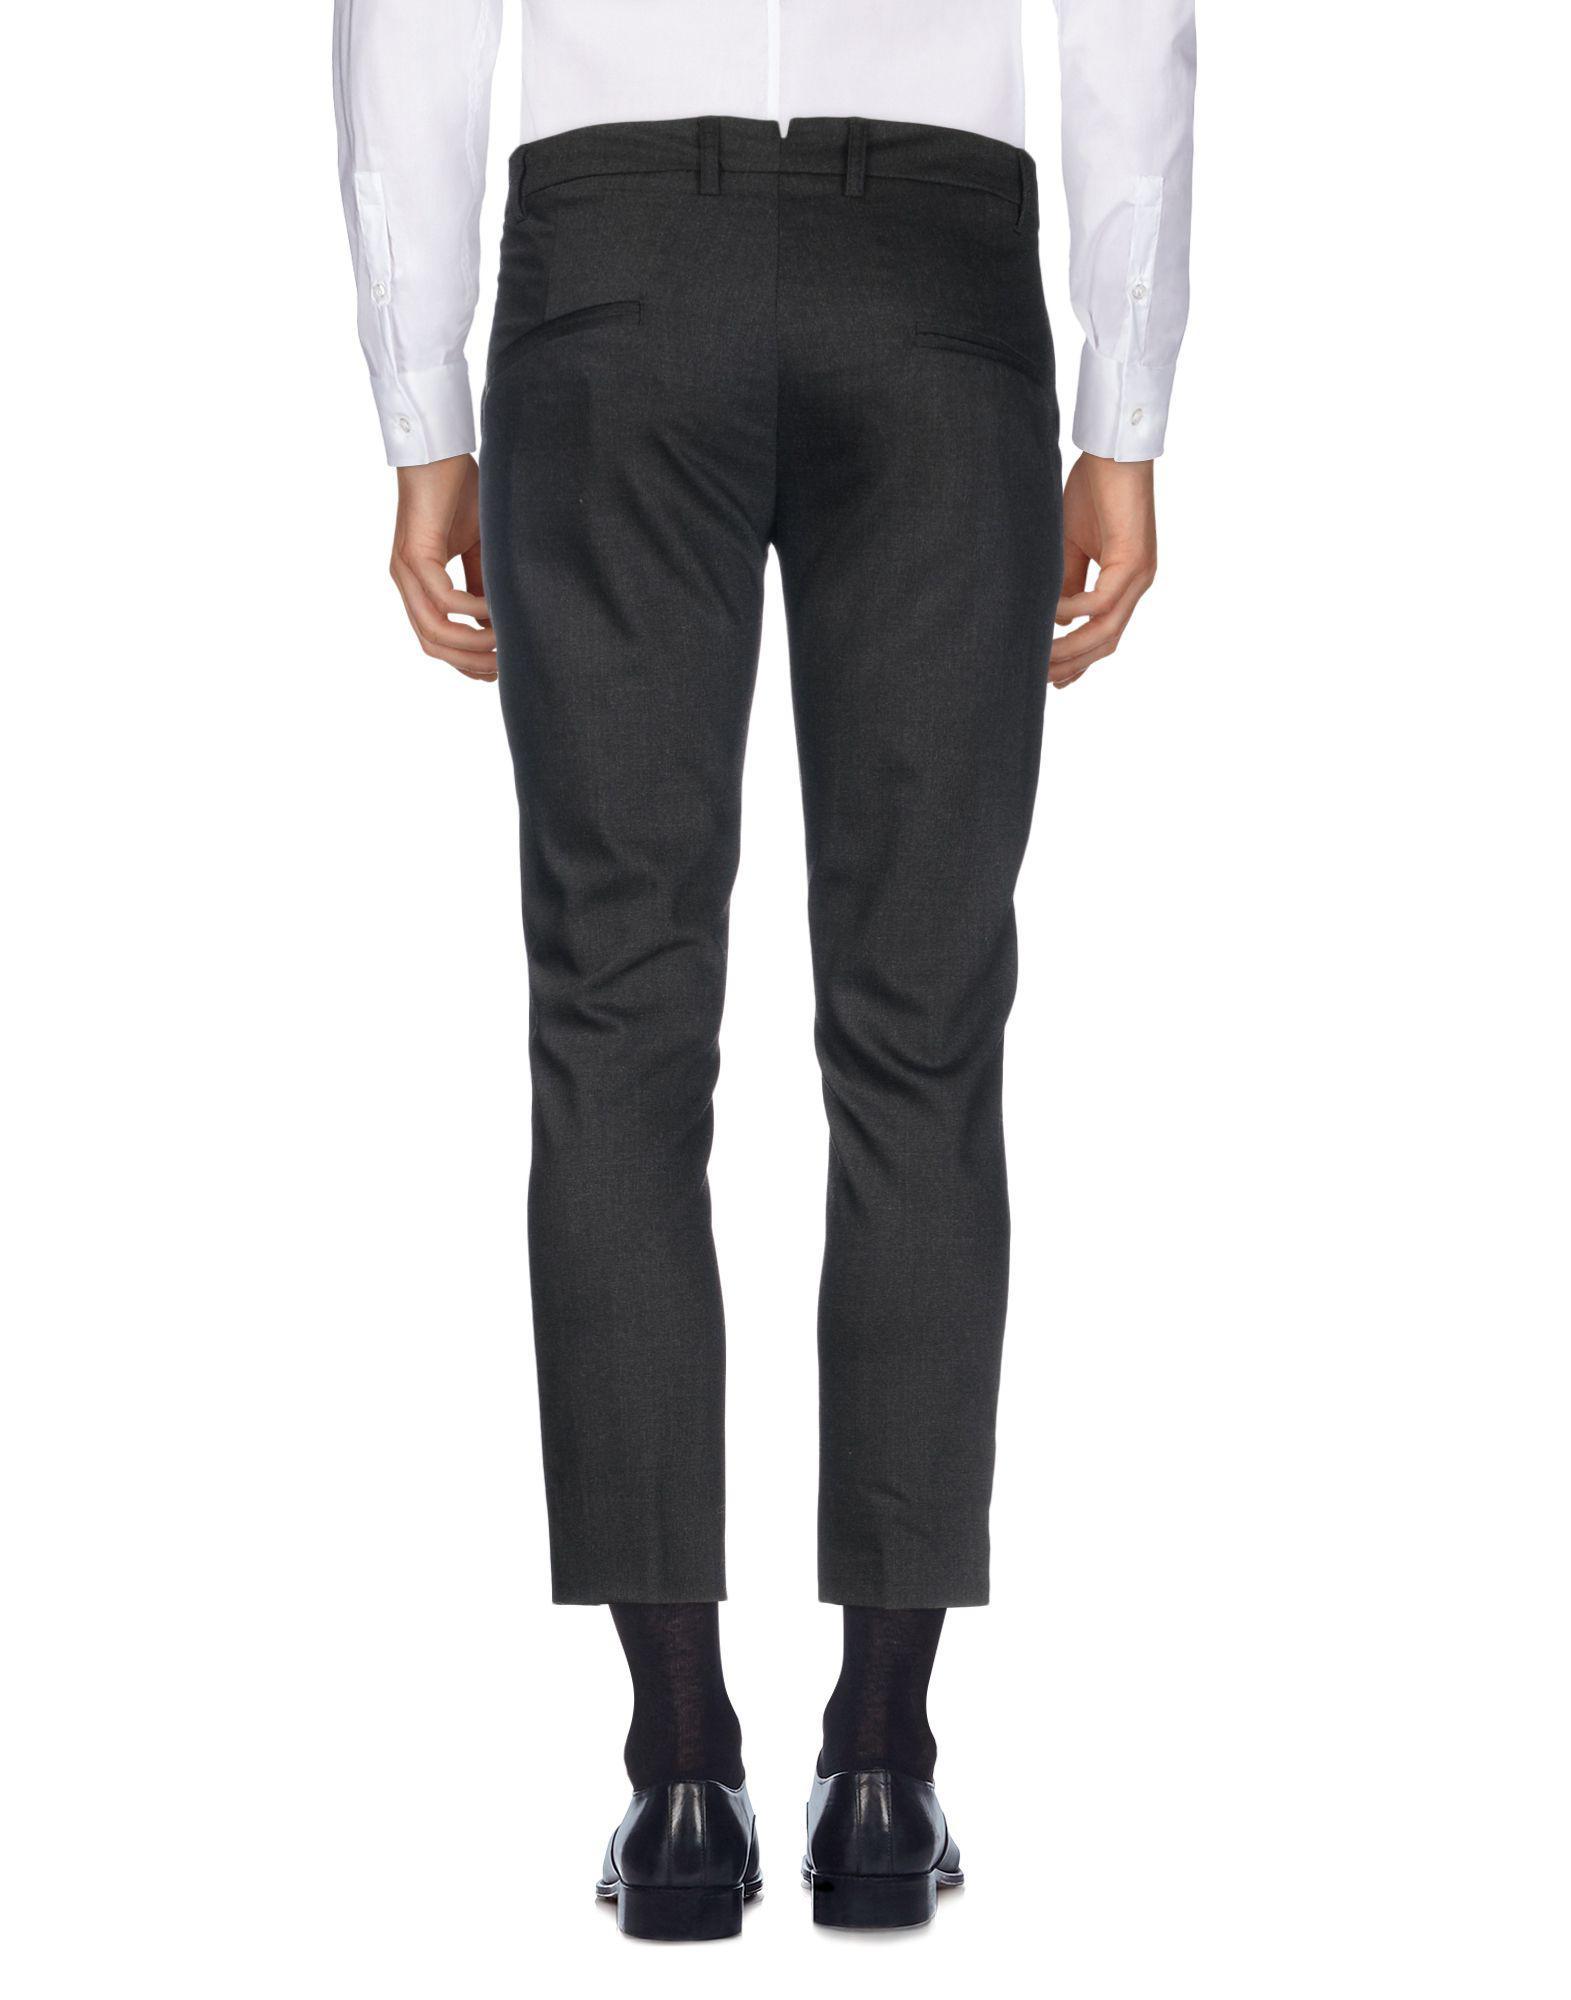 Maestrami Flannel Casual Pants in Steel Grey (Grey) for Men